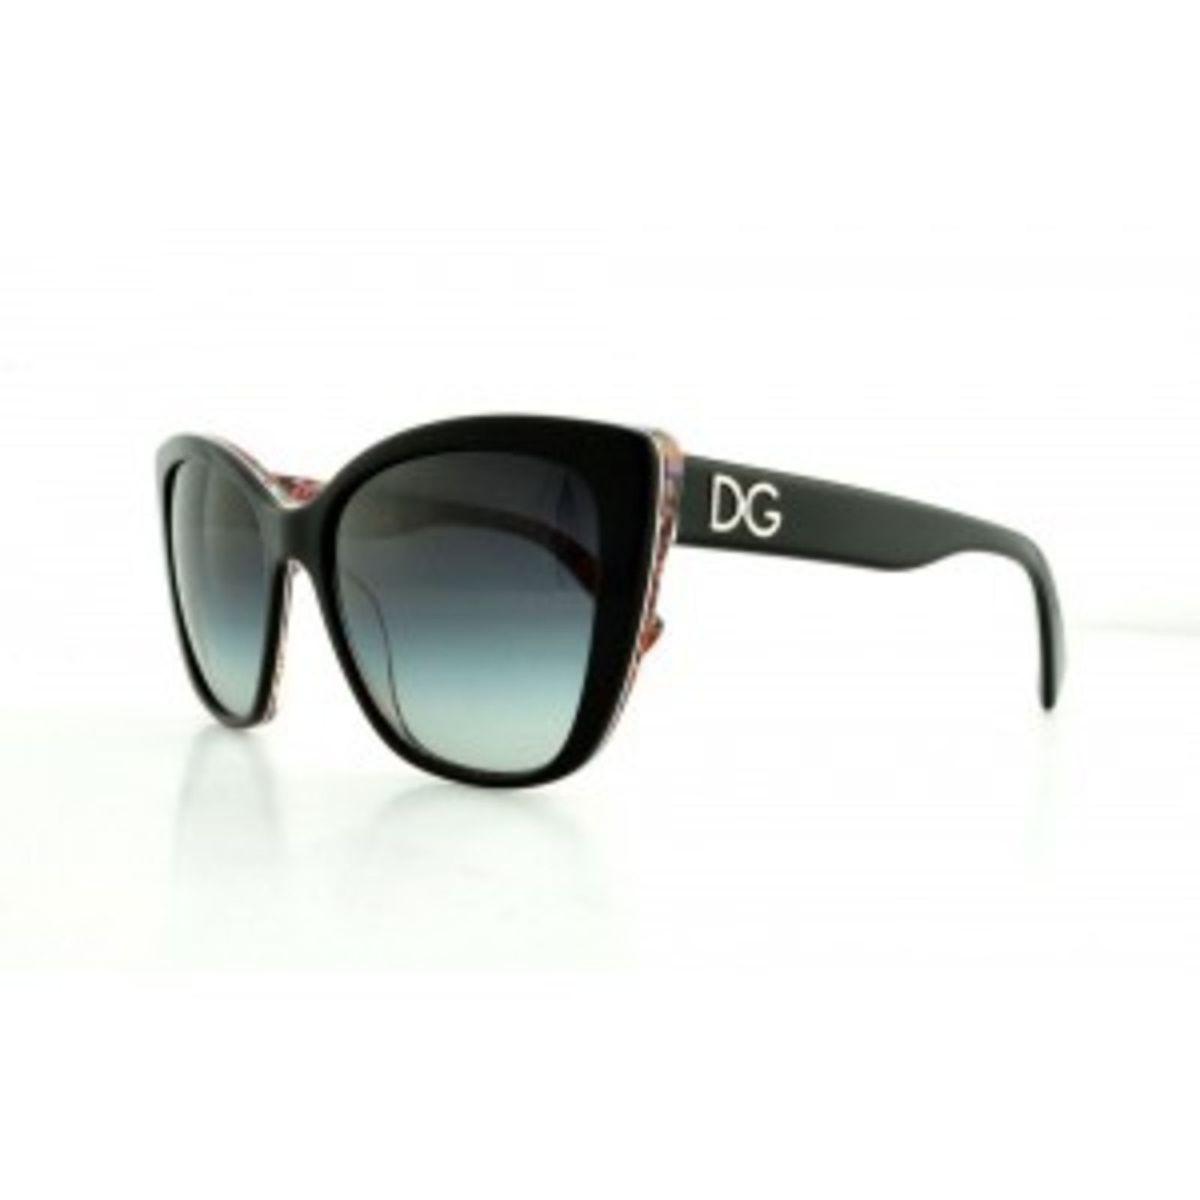 dolce  amp  gabbana dg 4216 - óculos de sol - óculos dolce   gabbana 62b4b1d670